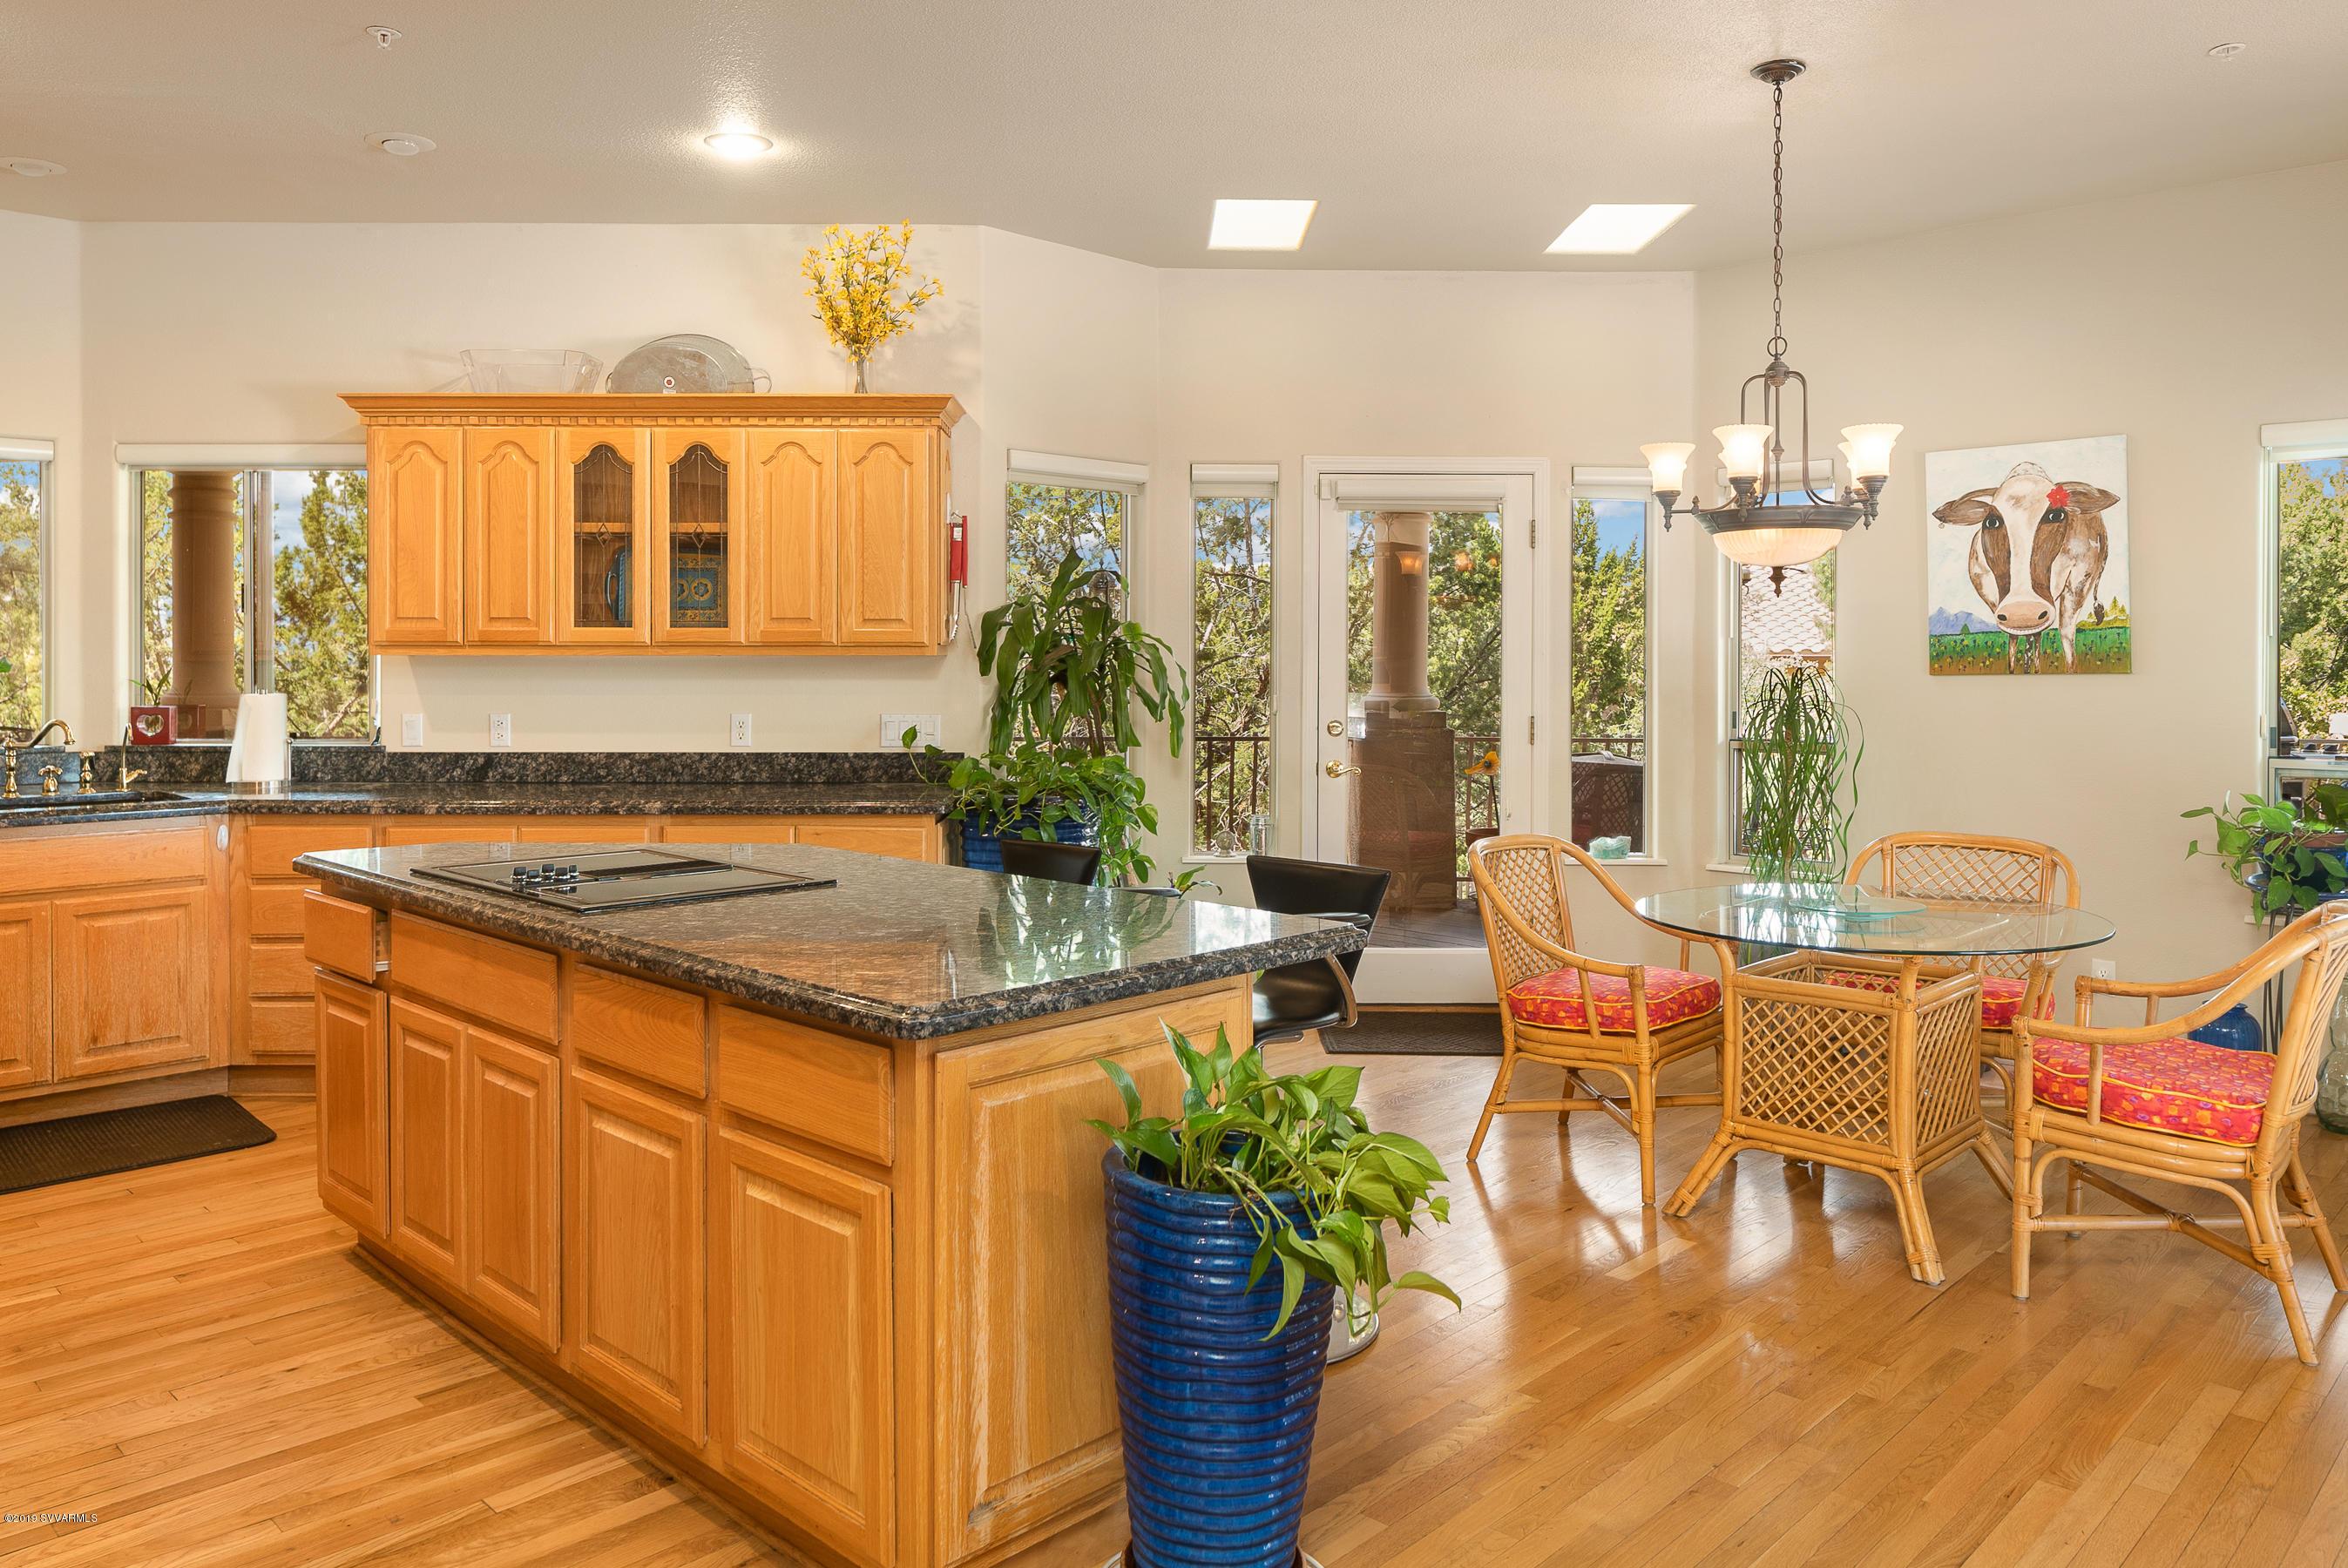 170 Linda Vista Sedona, AZ 86336